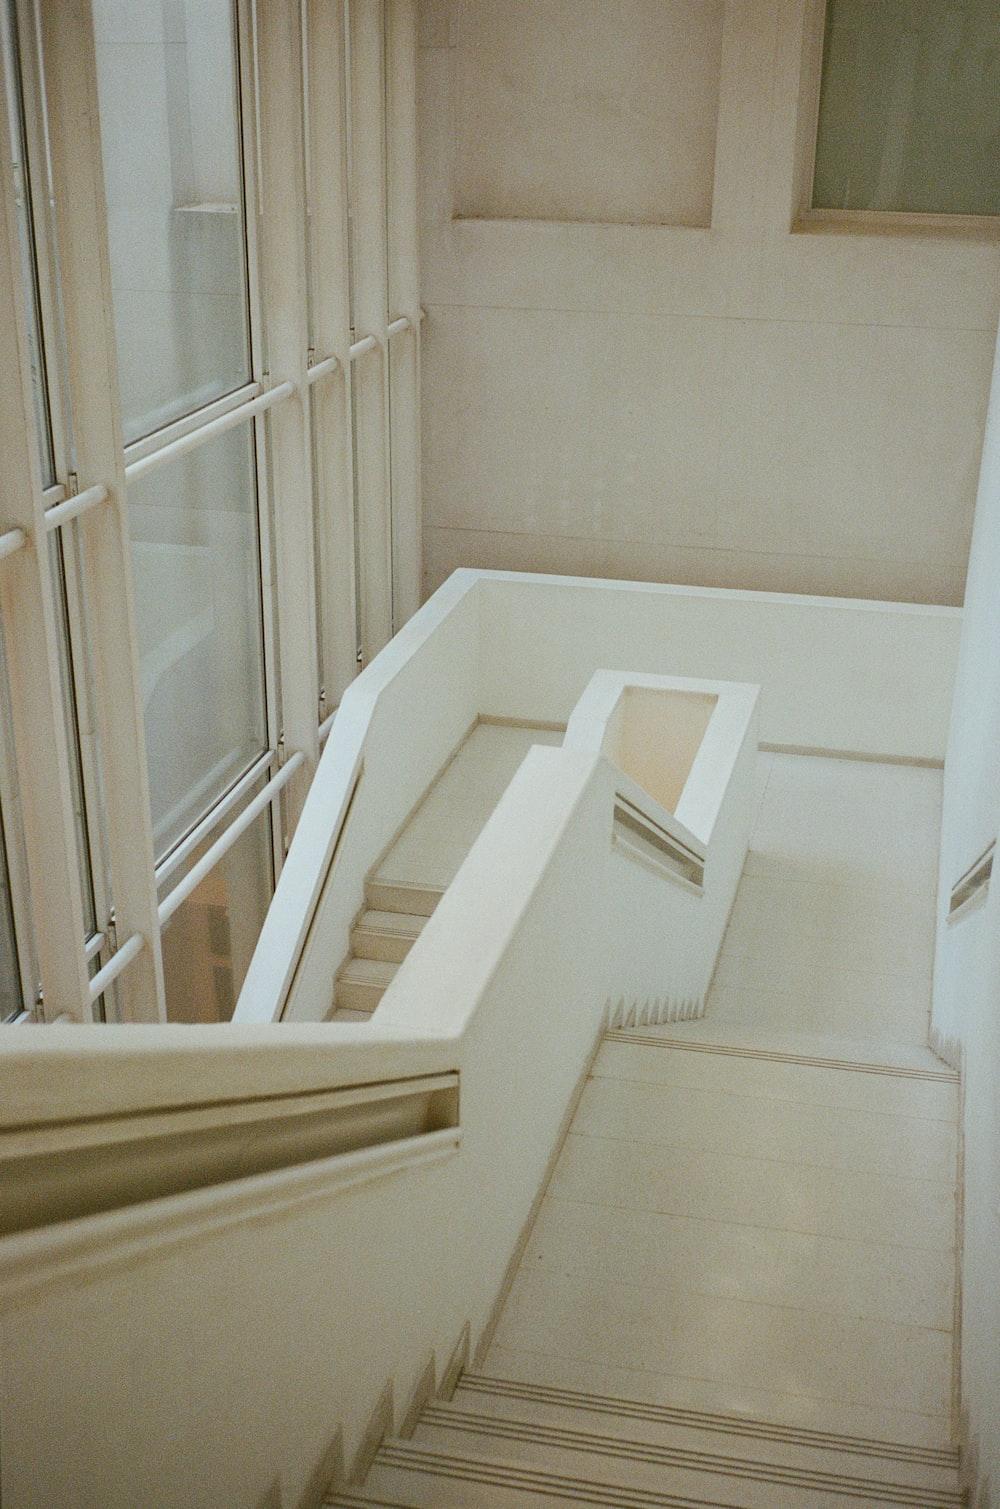 white wooden staircase near white wooden framed glass window